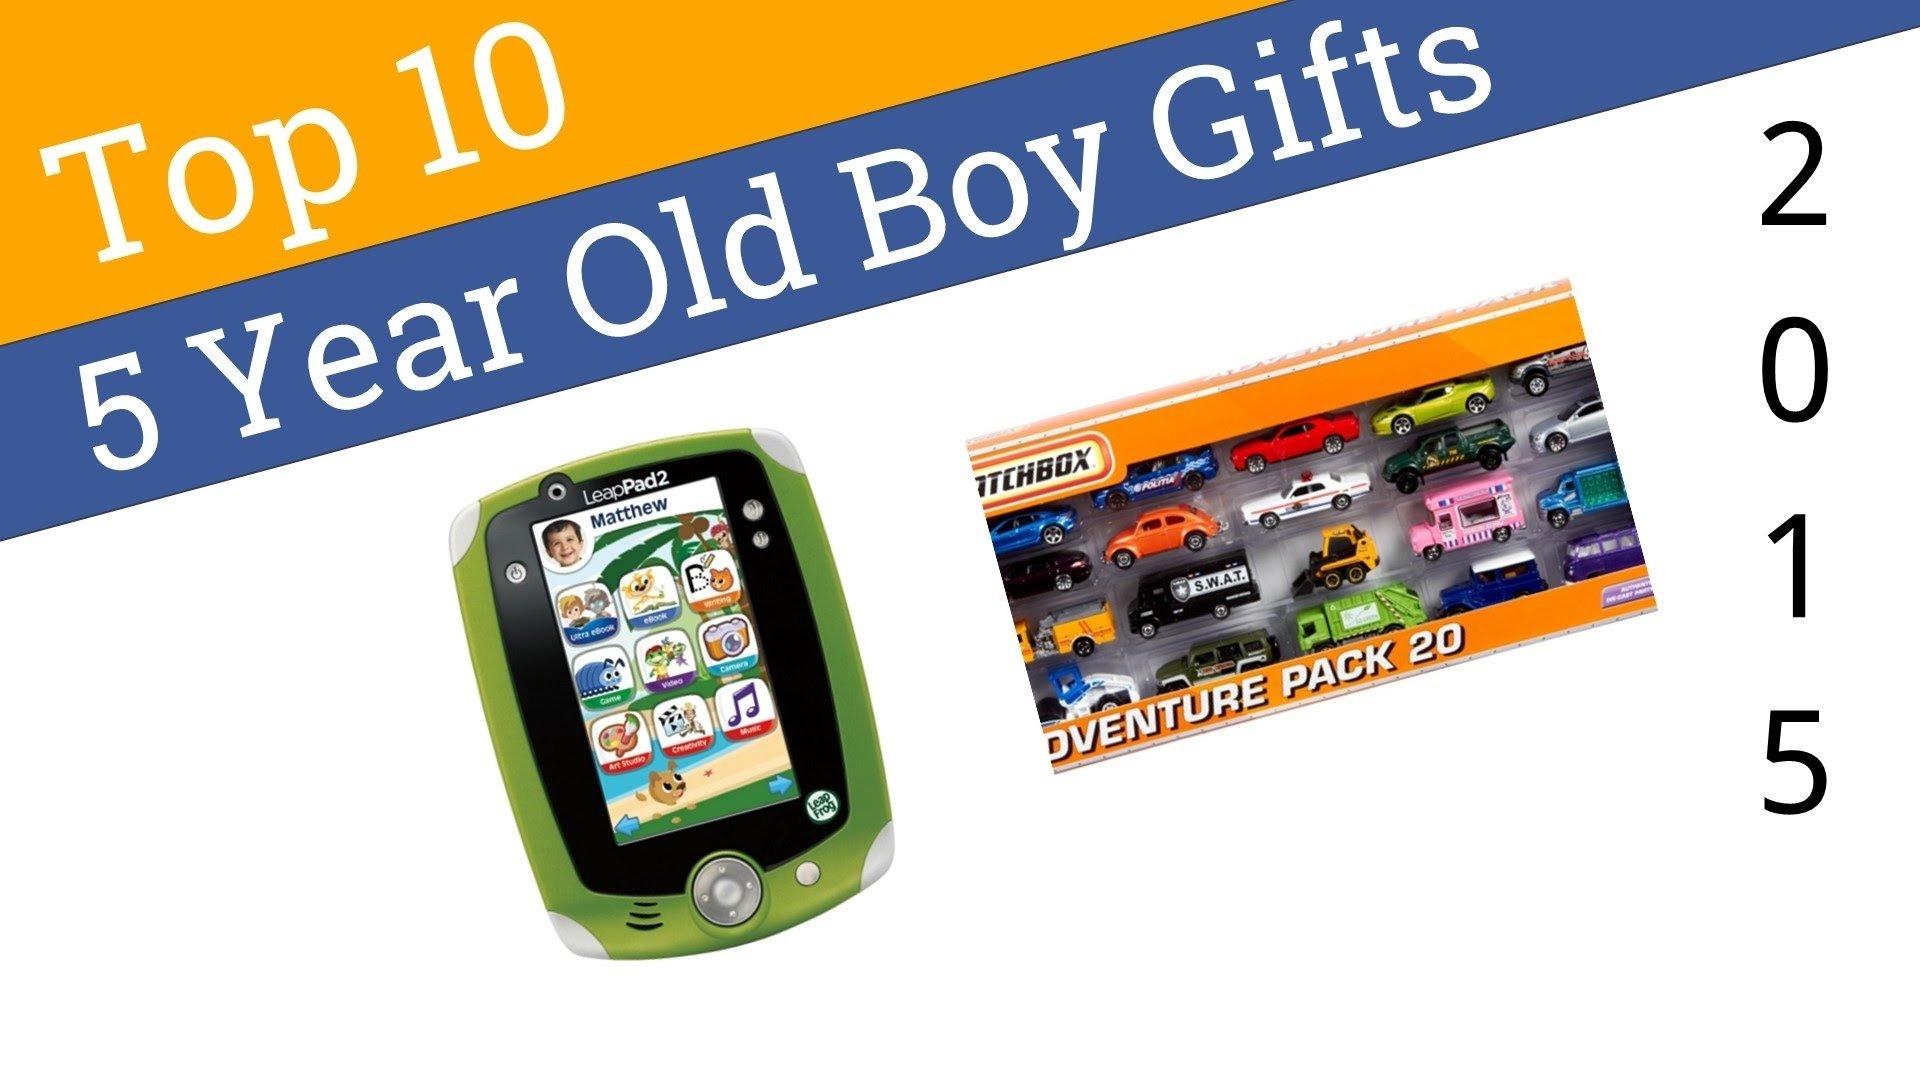 10 Elegant Year Old Boy Birthday Gift Ideas Best 5 Gifts